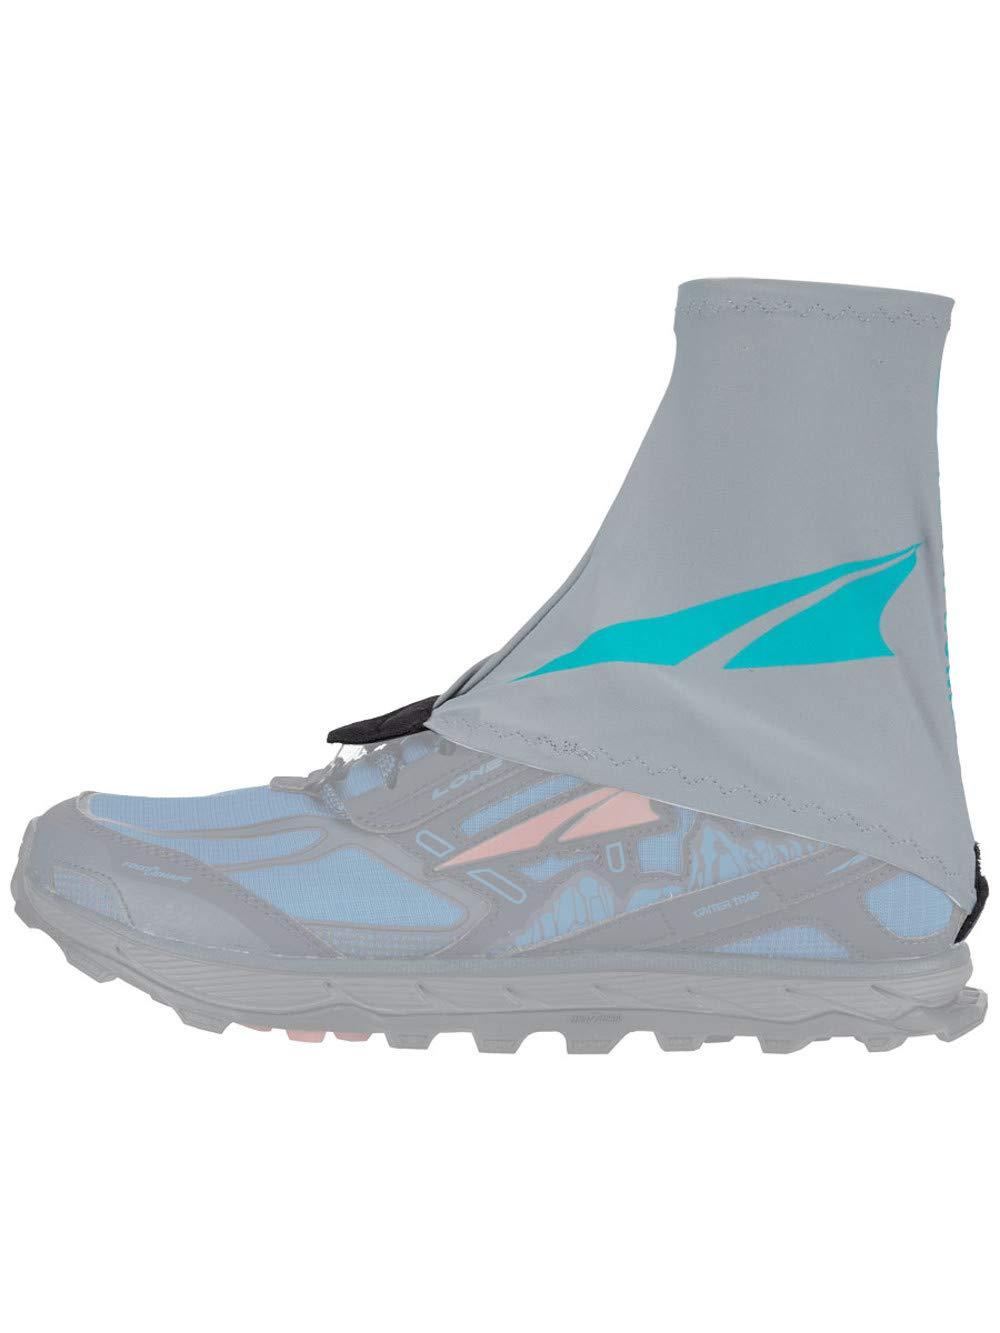 Altra Trail Gaiter, Grey/Teal, L/XL